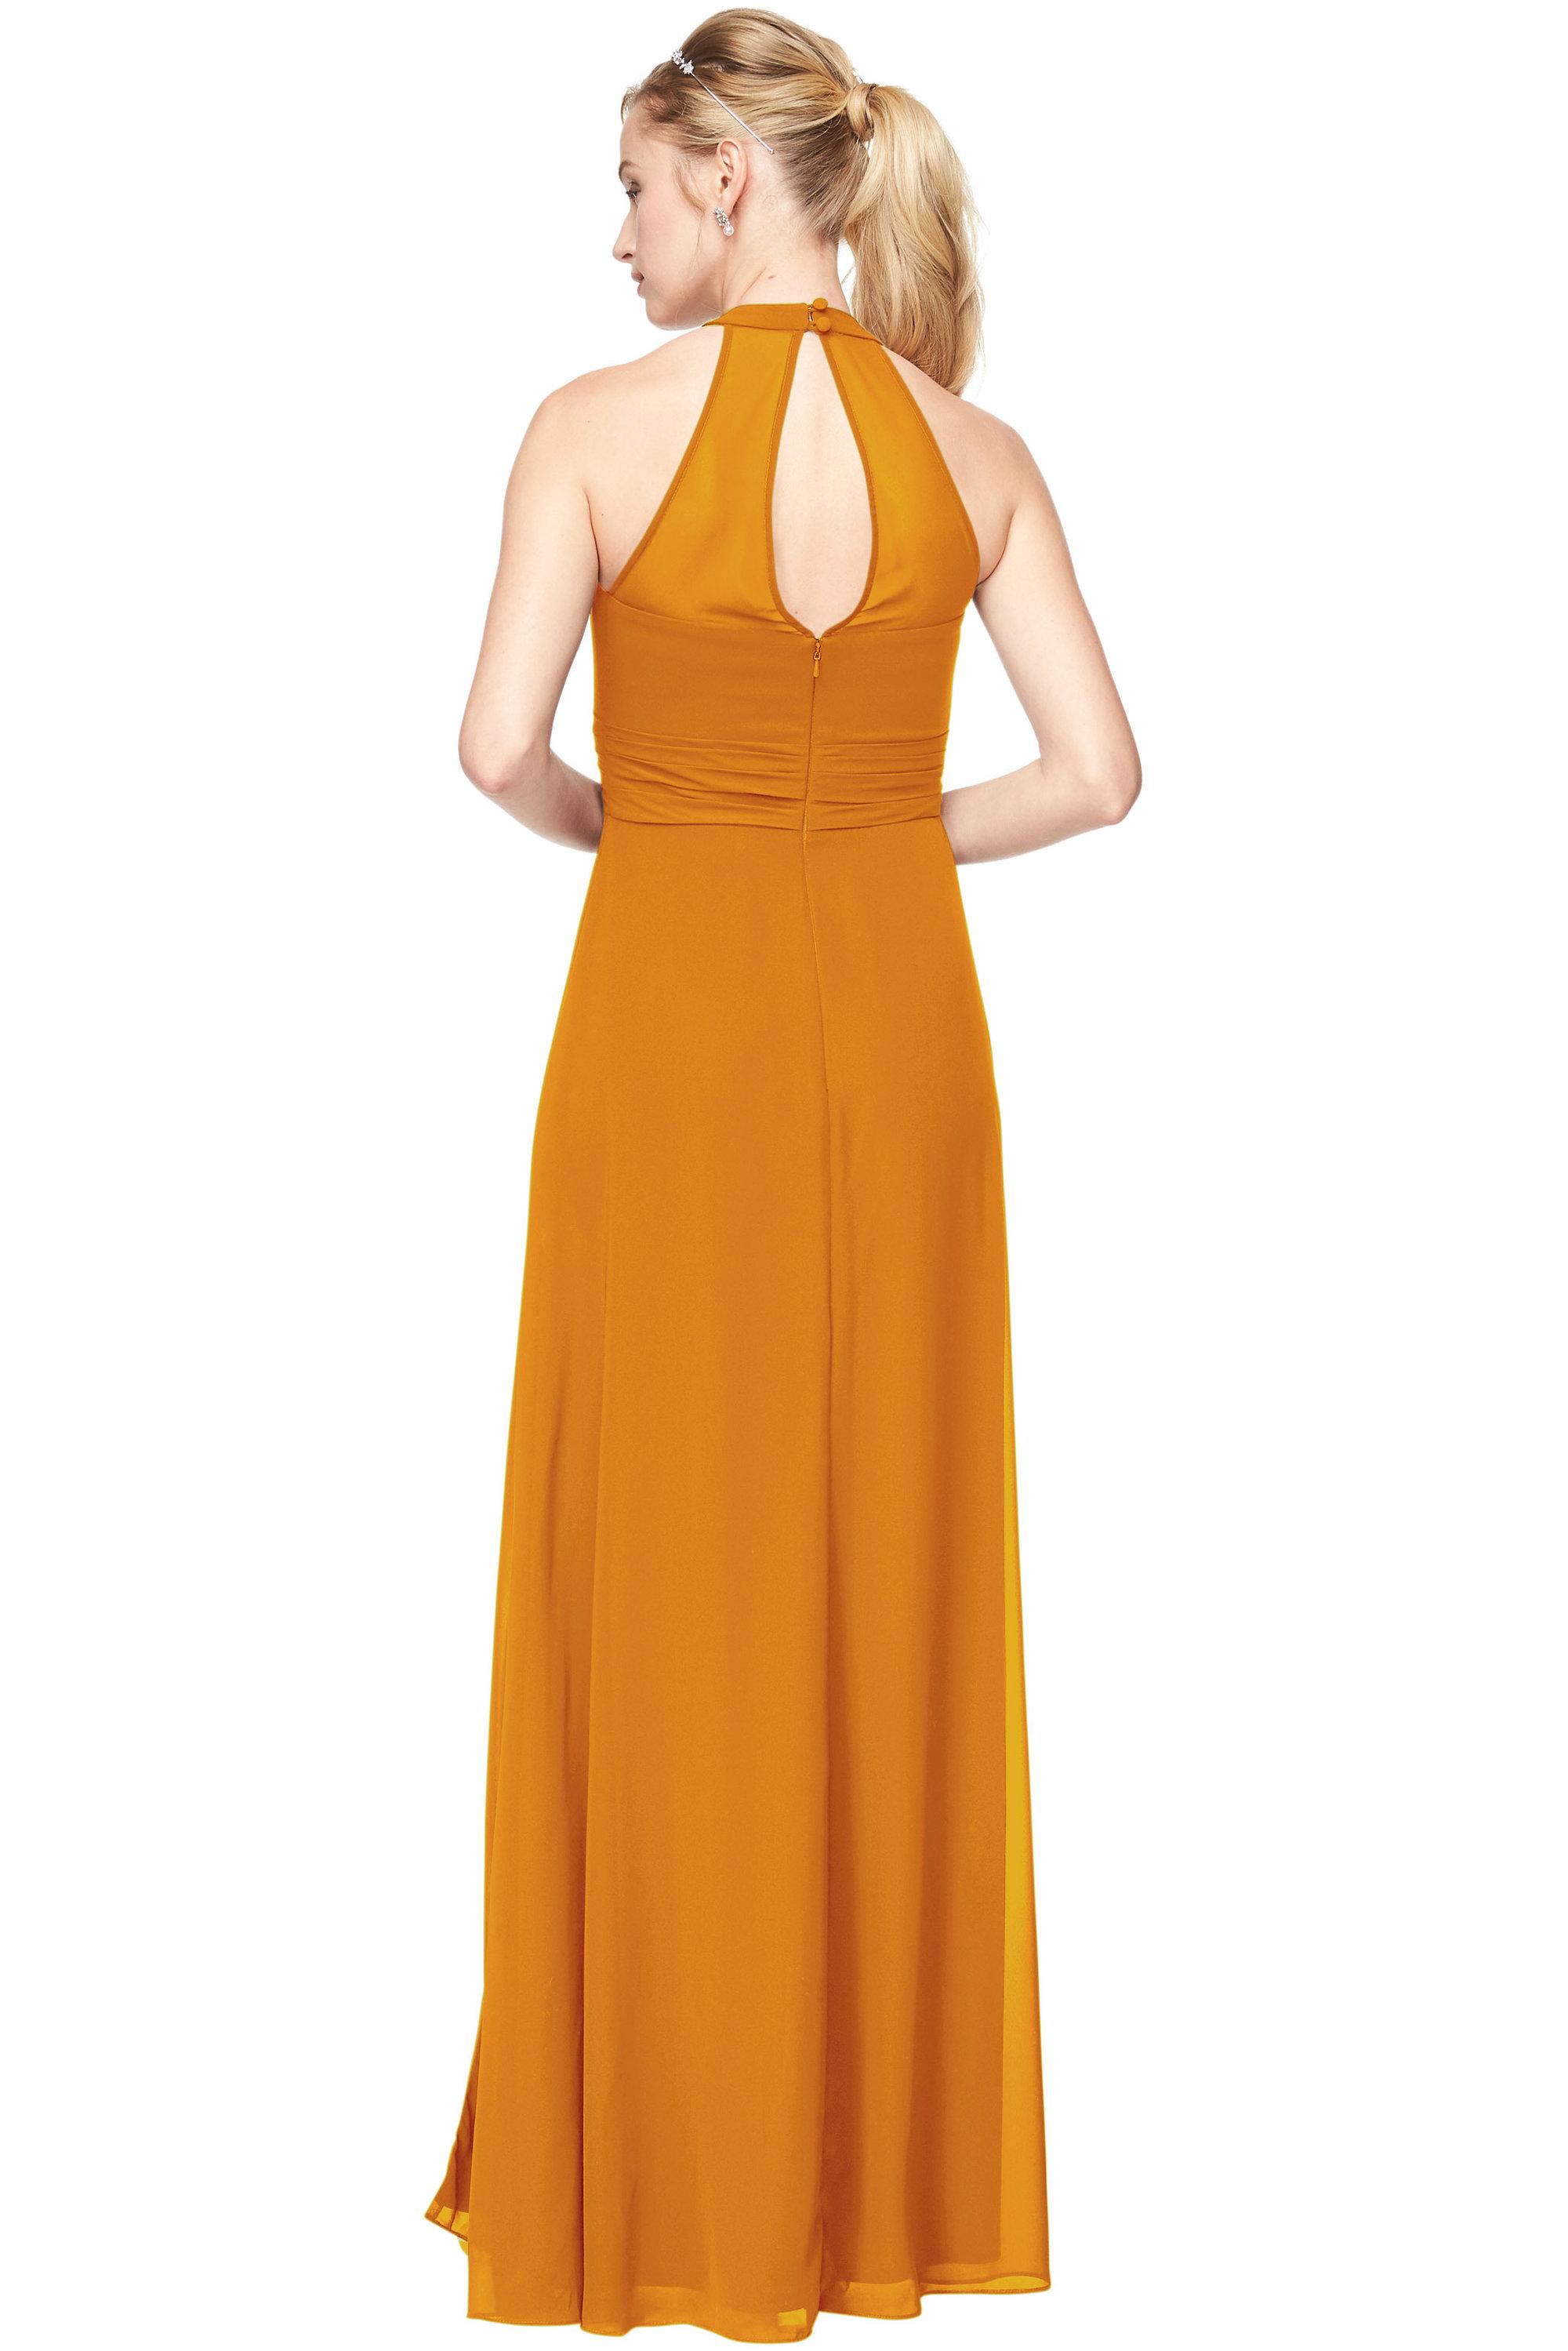 Bill Levkoff GOLD Chiffon V-Neck A-Line gown, $198.00 Back